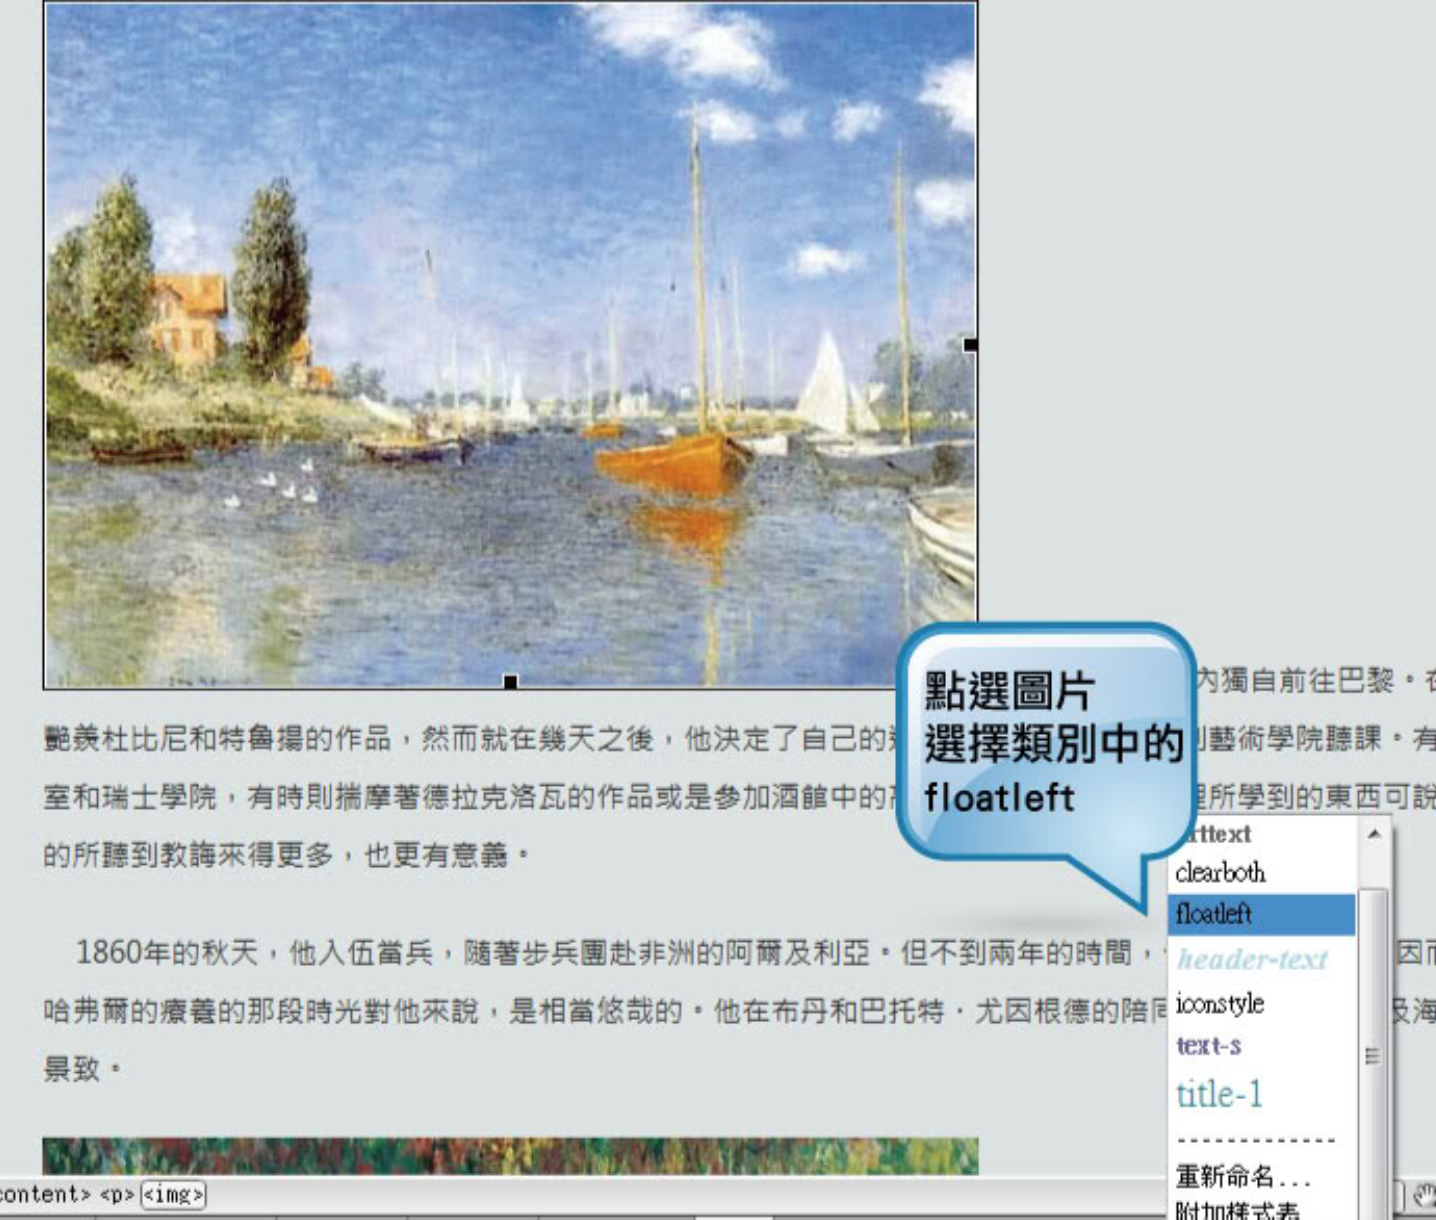 http://mepopedia.com/~jinjin/web/img/506.png